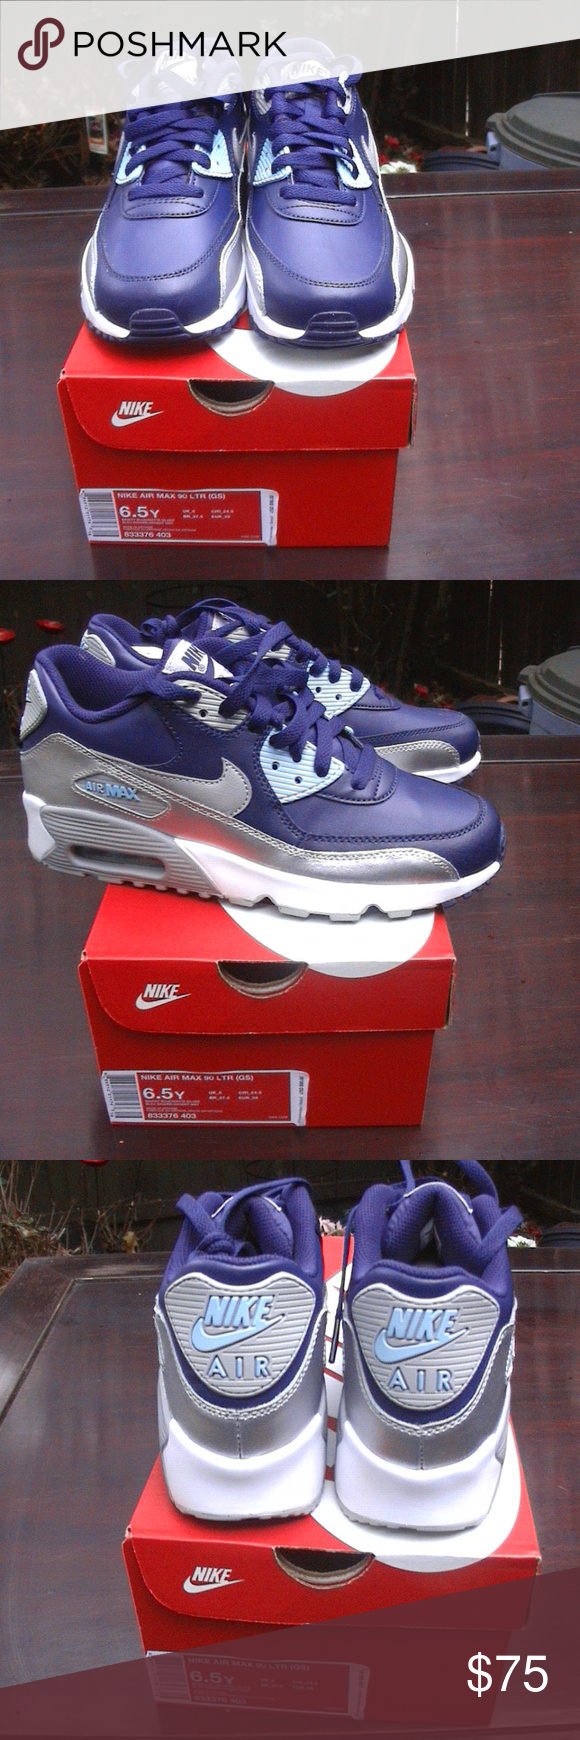 397b62ef NIKE AIR MAX 90 RARE BINARY BLUE SILVER SHOES Brand new pair of Nike Air Max